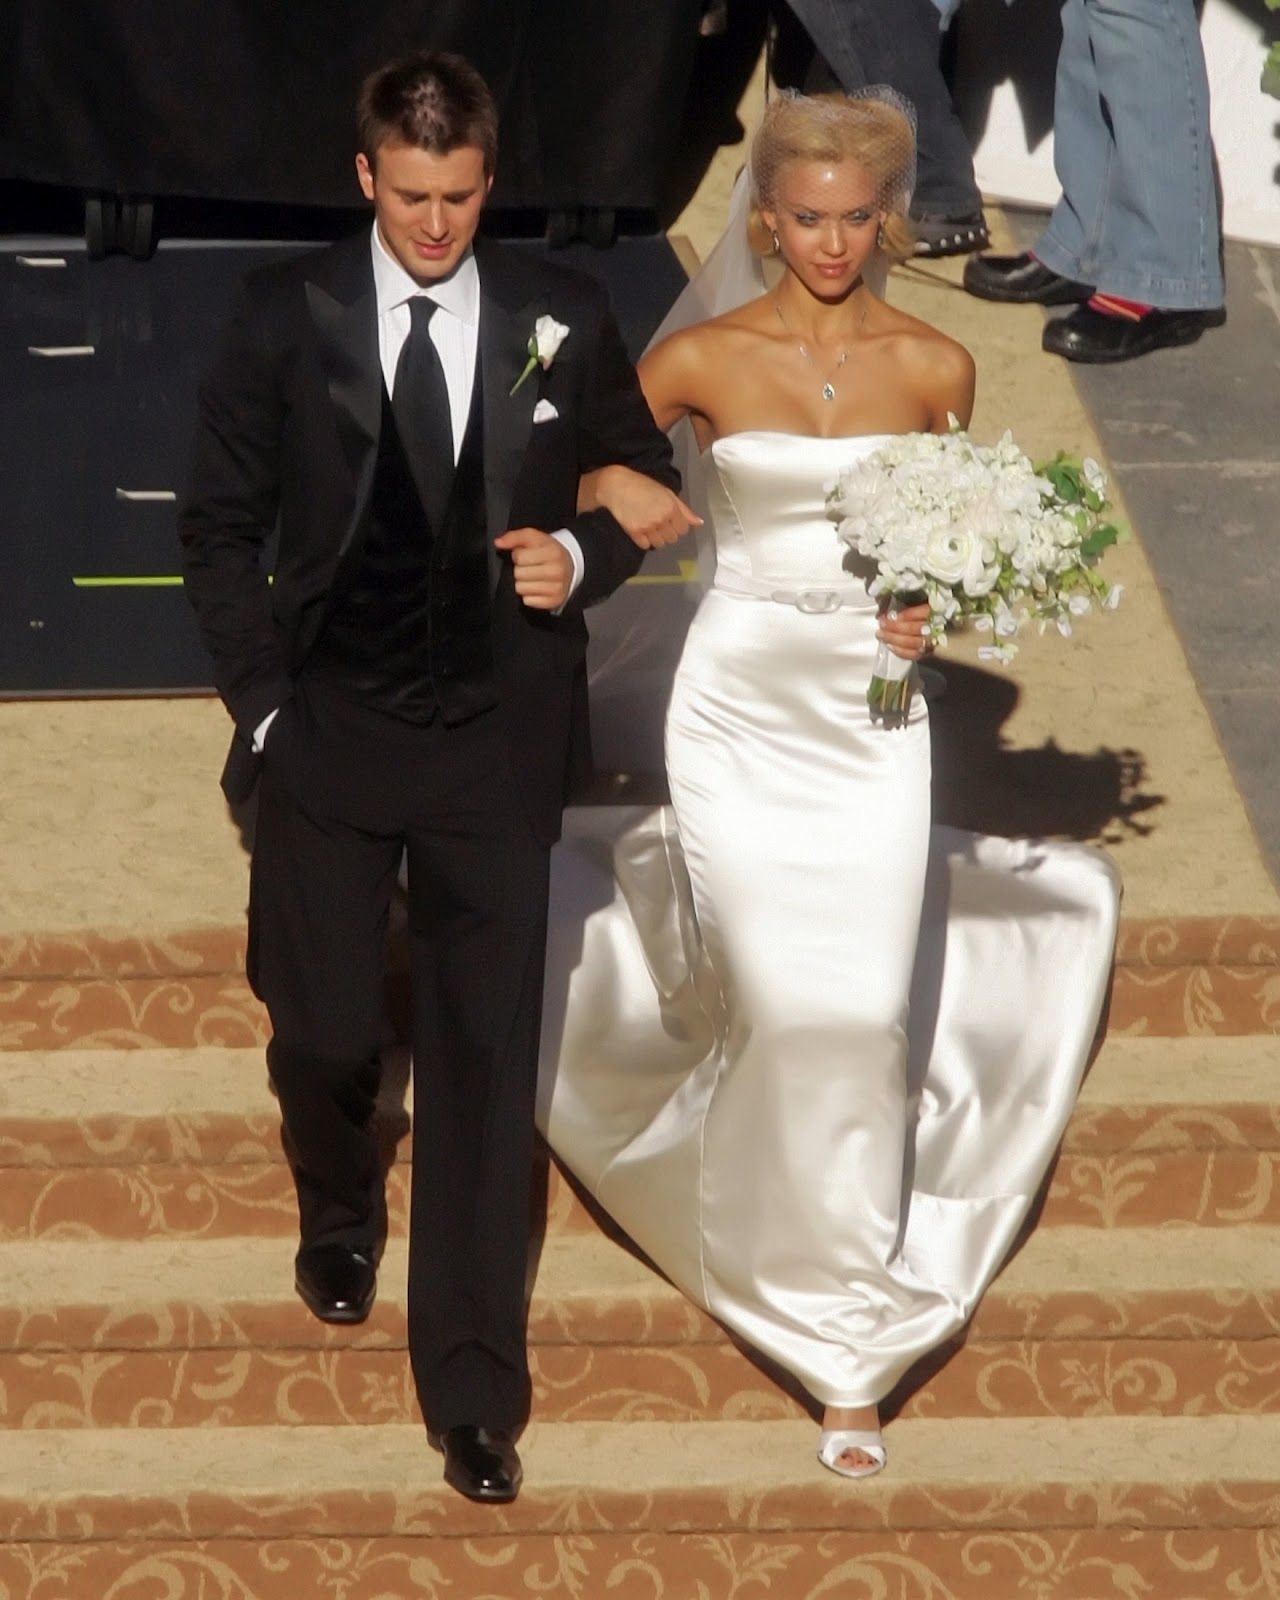 Wedding Dress From Fantastic Four